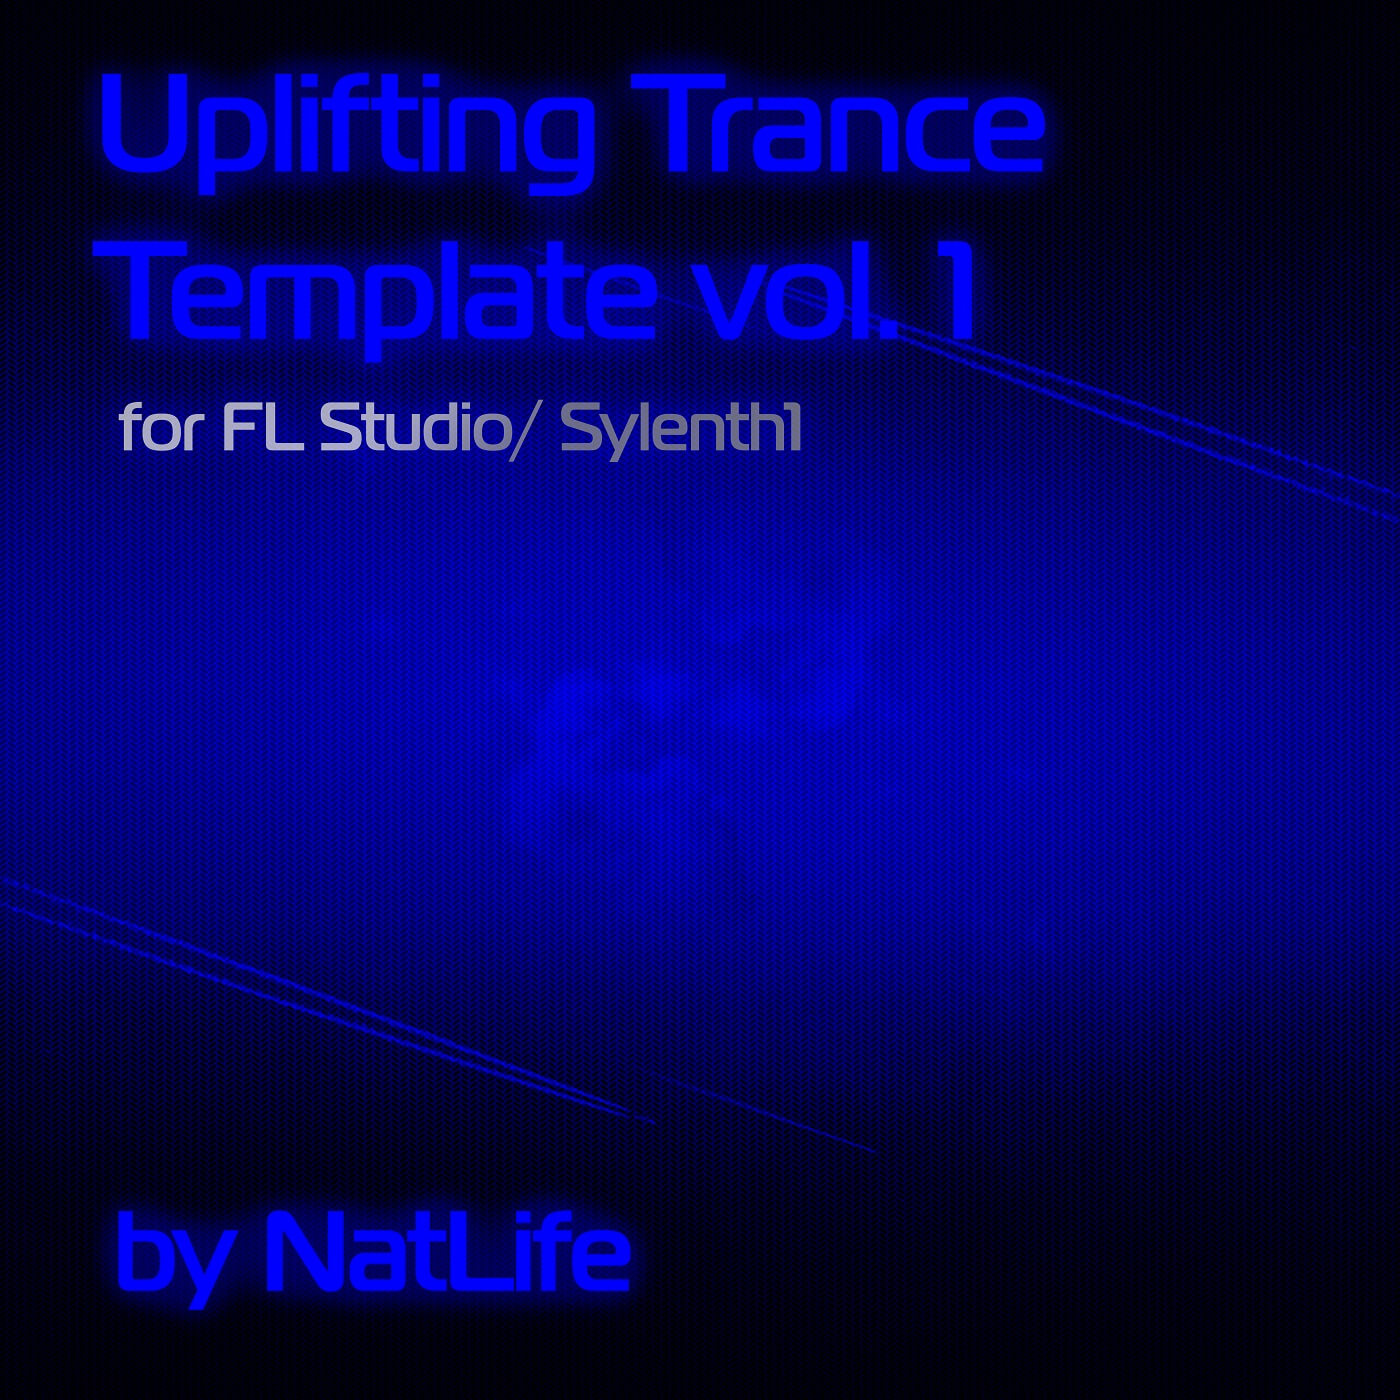 Uplifting Trance Template vol. 1